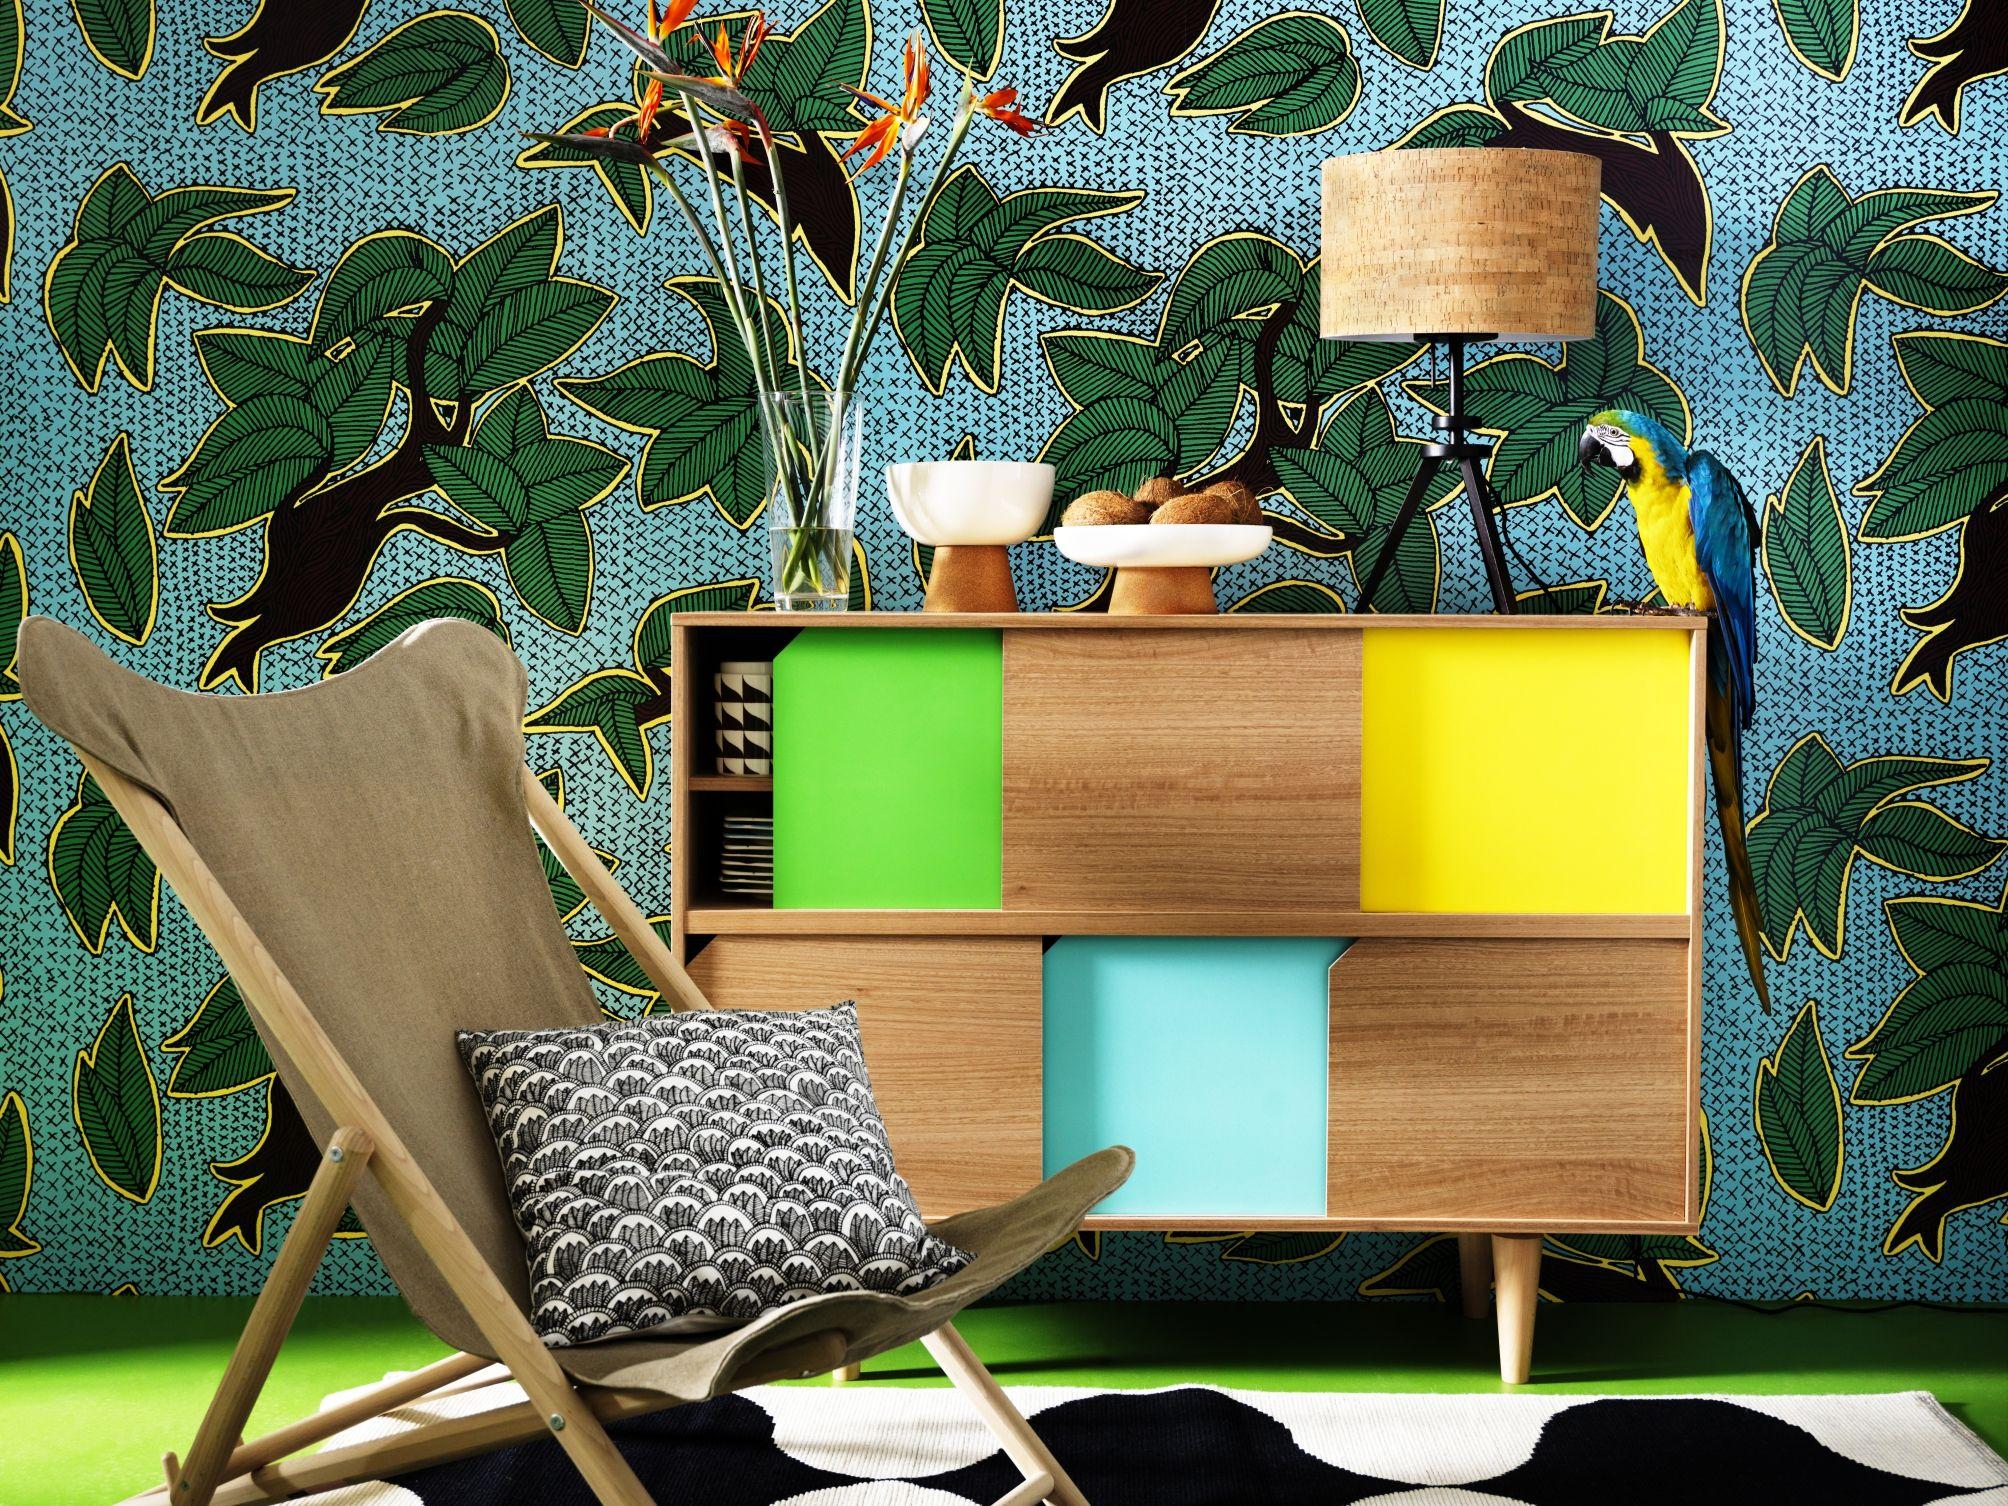 659a667d7850f1aa0ab2a4d4974eb1d3 Frais De Bar De Salon Ikea Concept